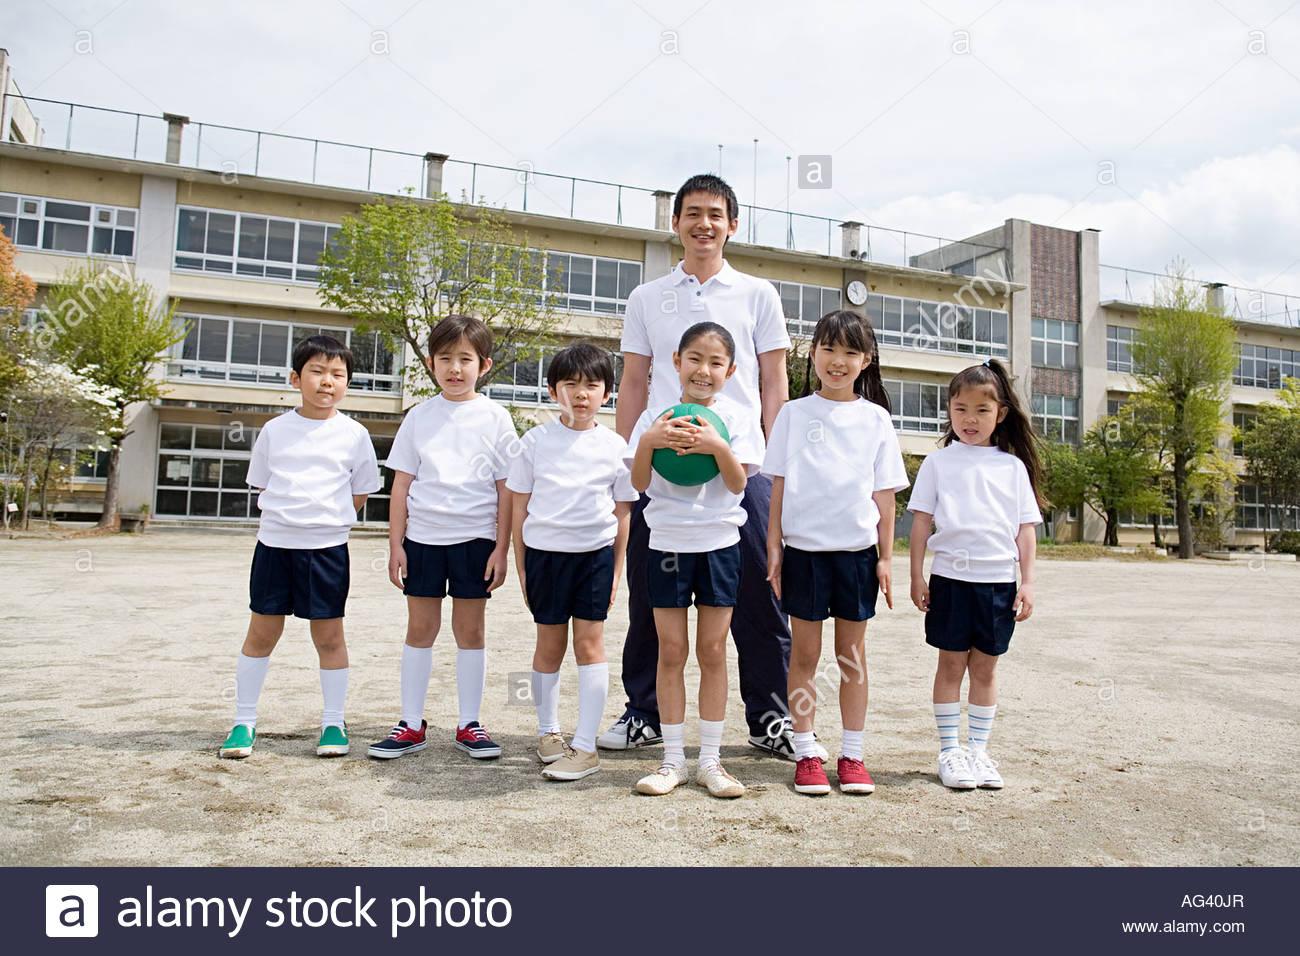 Portrait of school children and their teacher - Stock Image